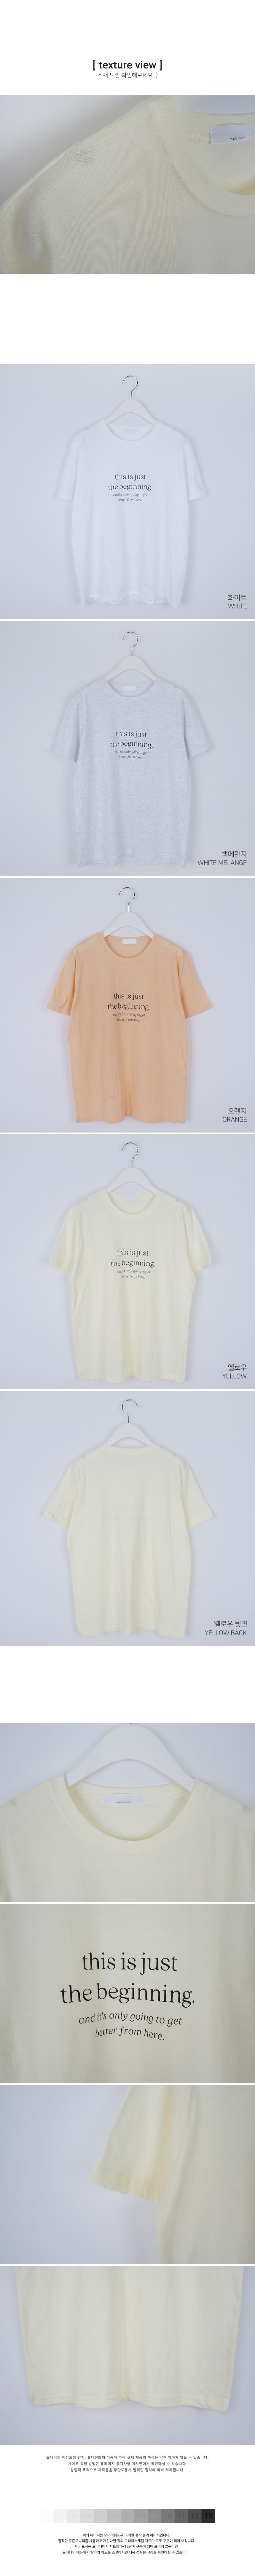 Beginning lettering t-shirt